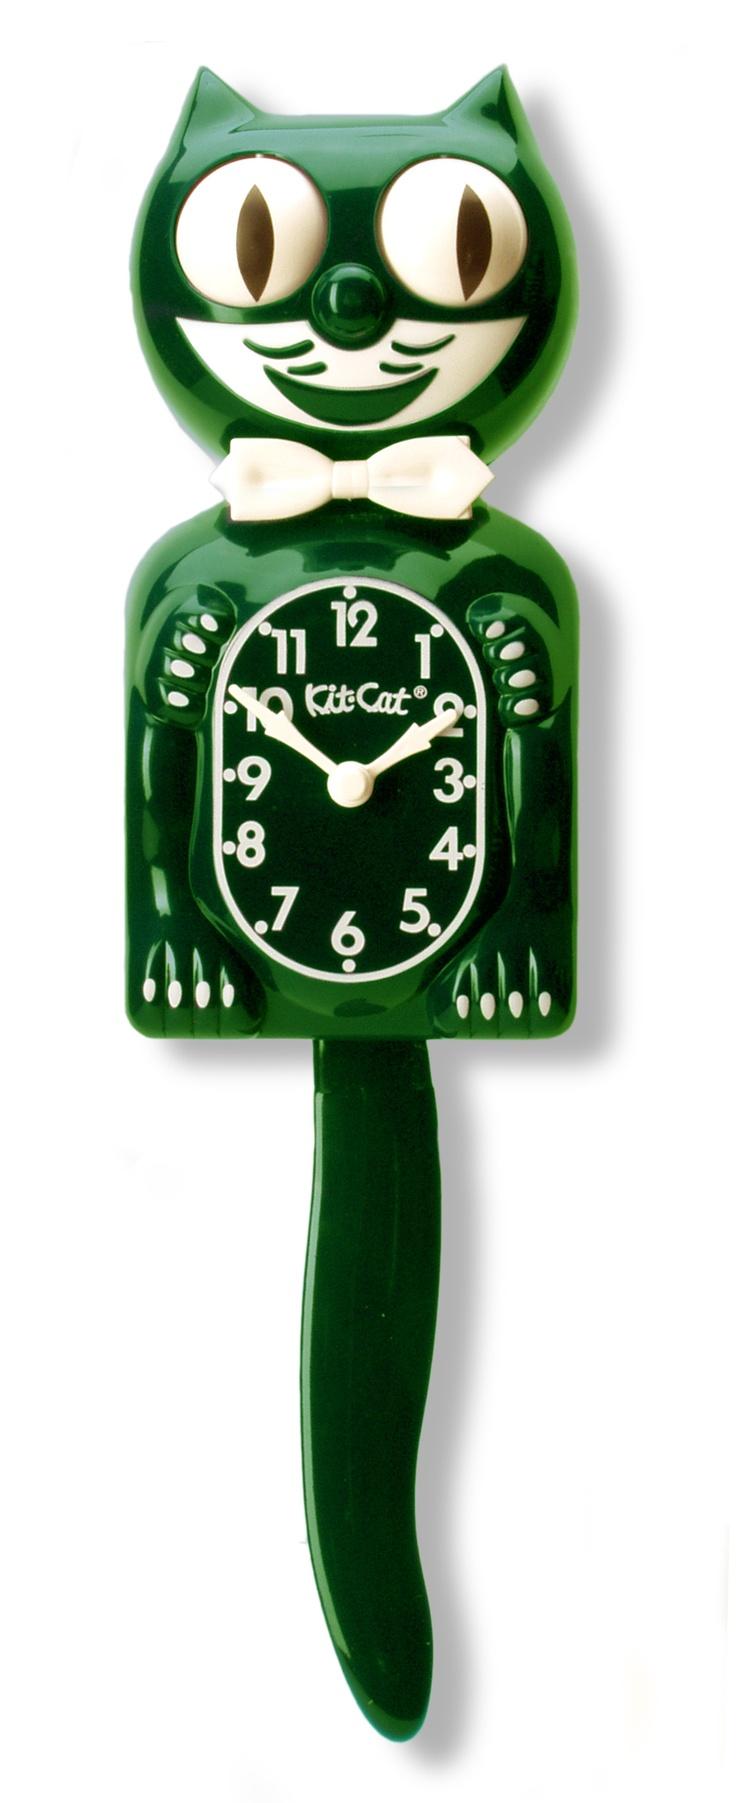 17 best ideas about cat clock on pinterest kit kat clock kitsch and vintage stuff. Black Bedroom Furniture Sets. Home Design Ideas